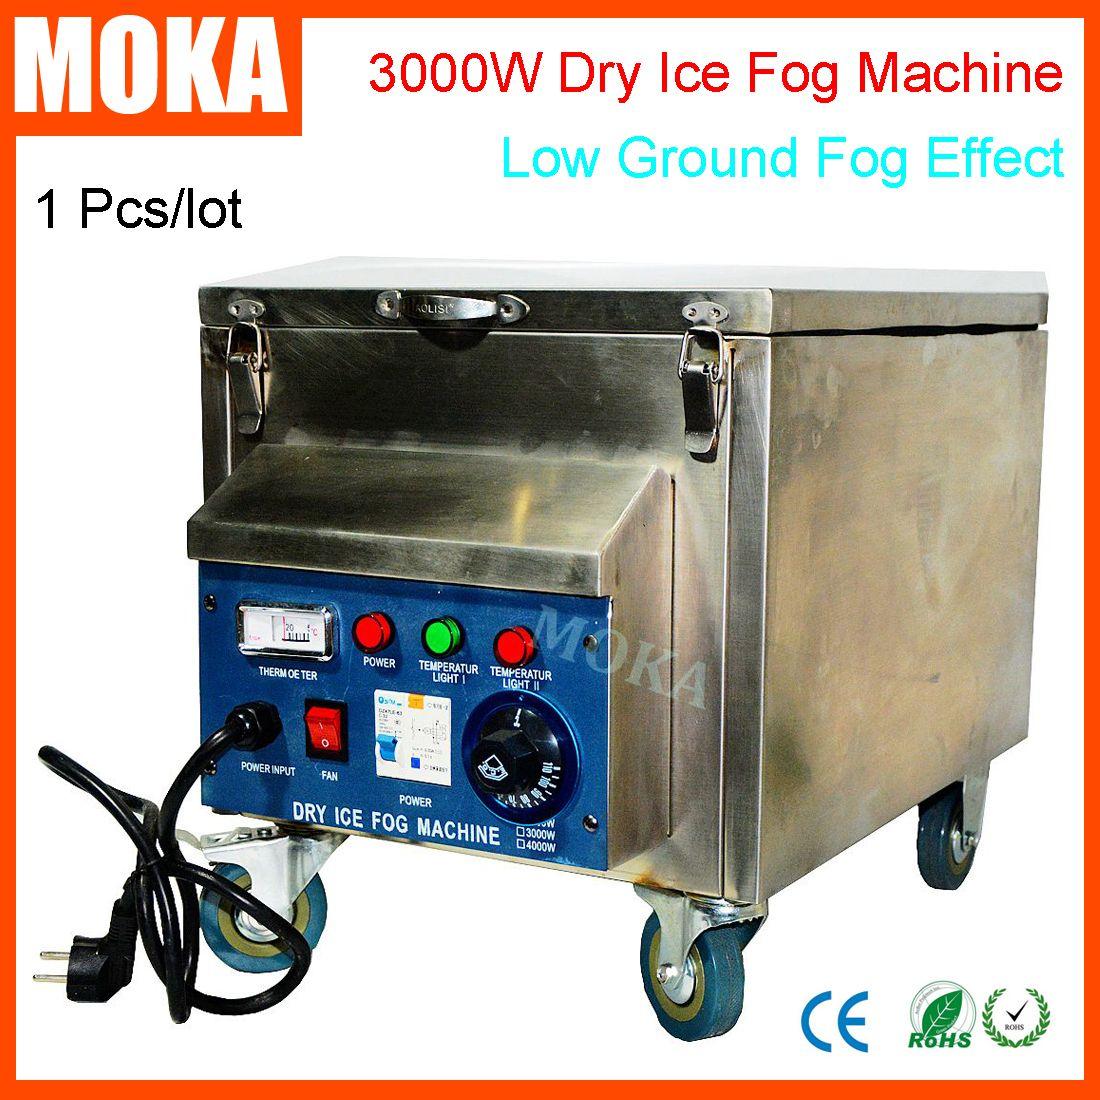 Grosshandel 1 Teile Los 3000 Watt Trockeneis Nebel Maschine